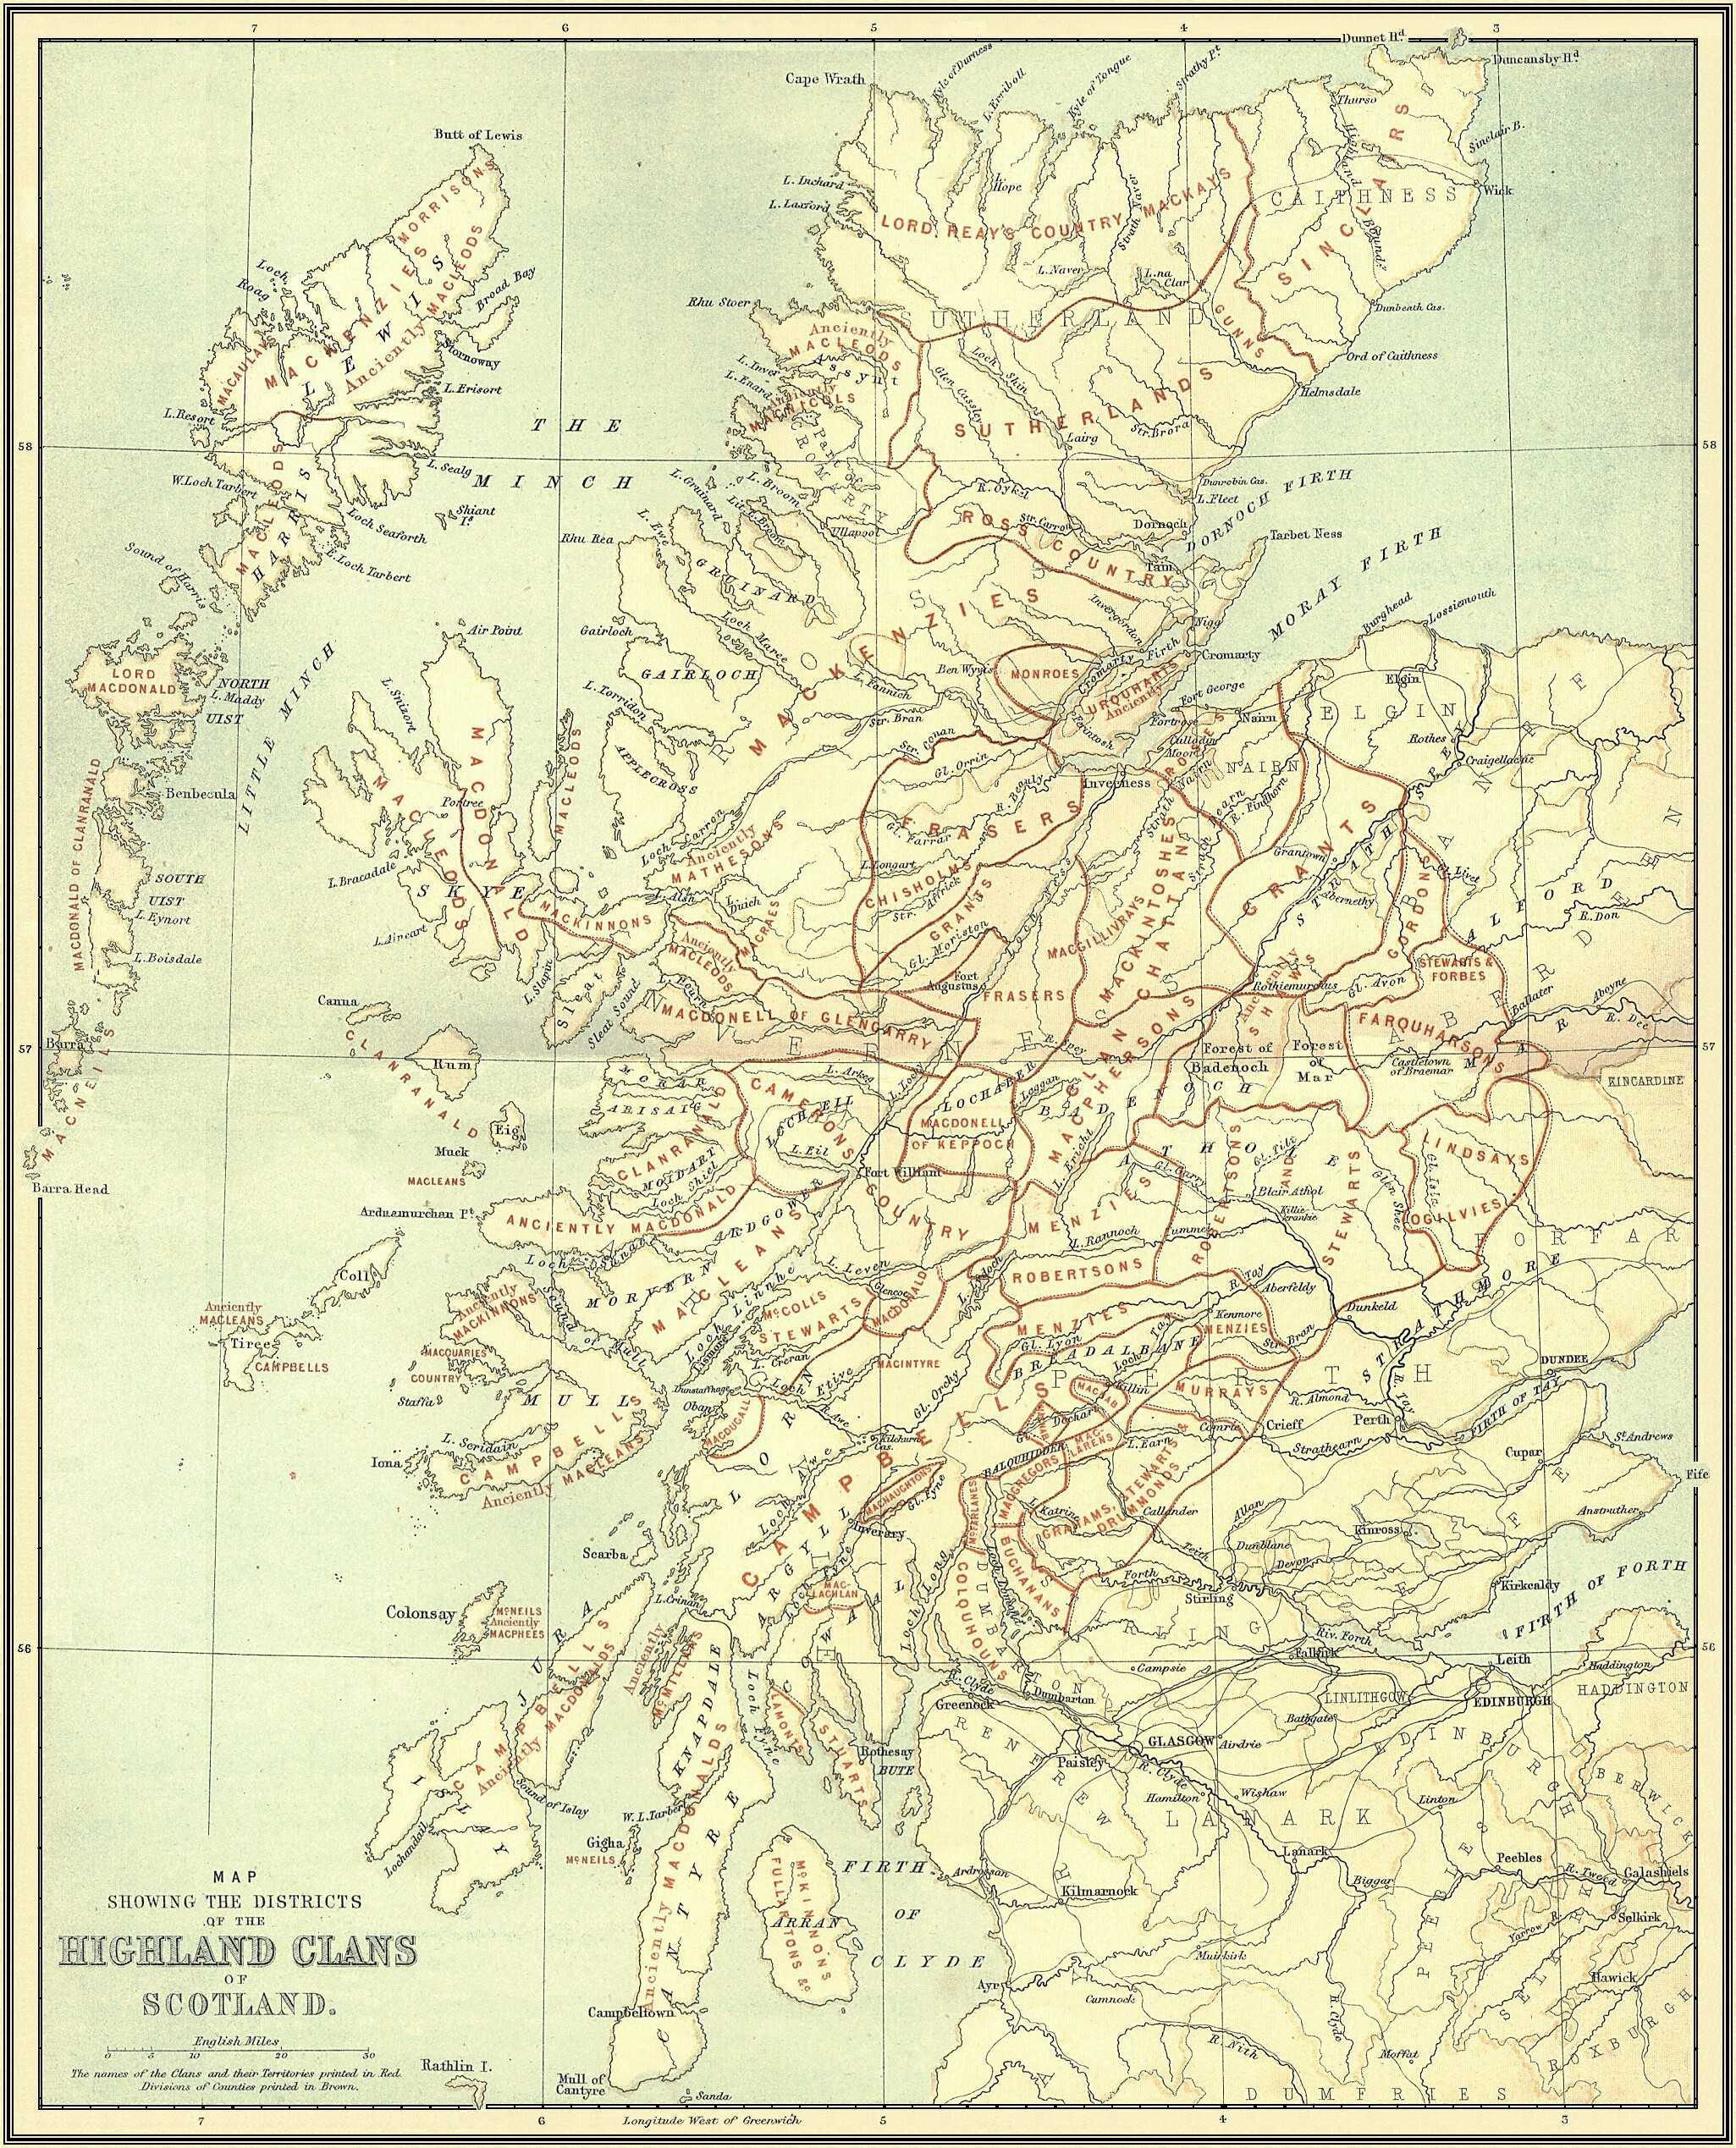 1740 scotland - 1740 Scotland 12